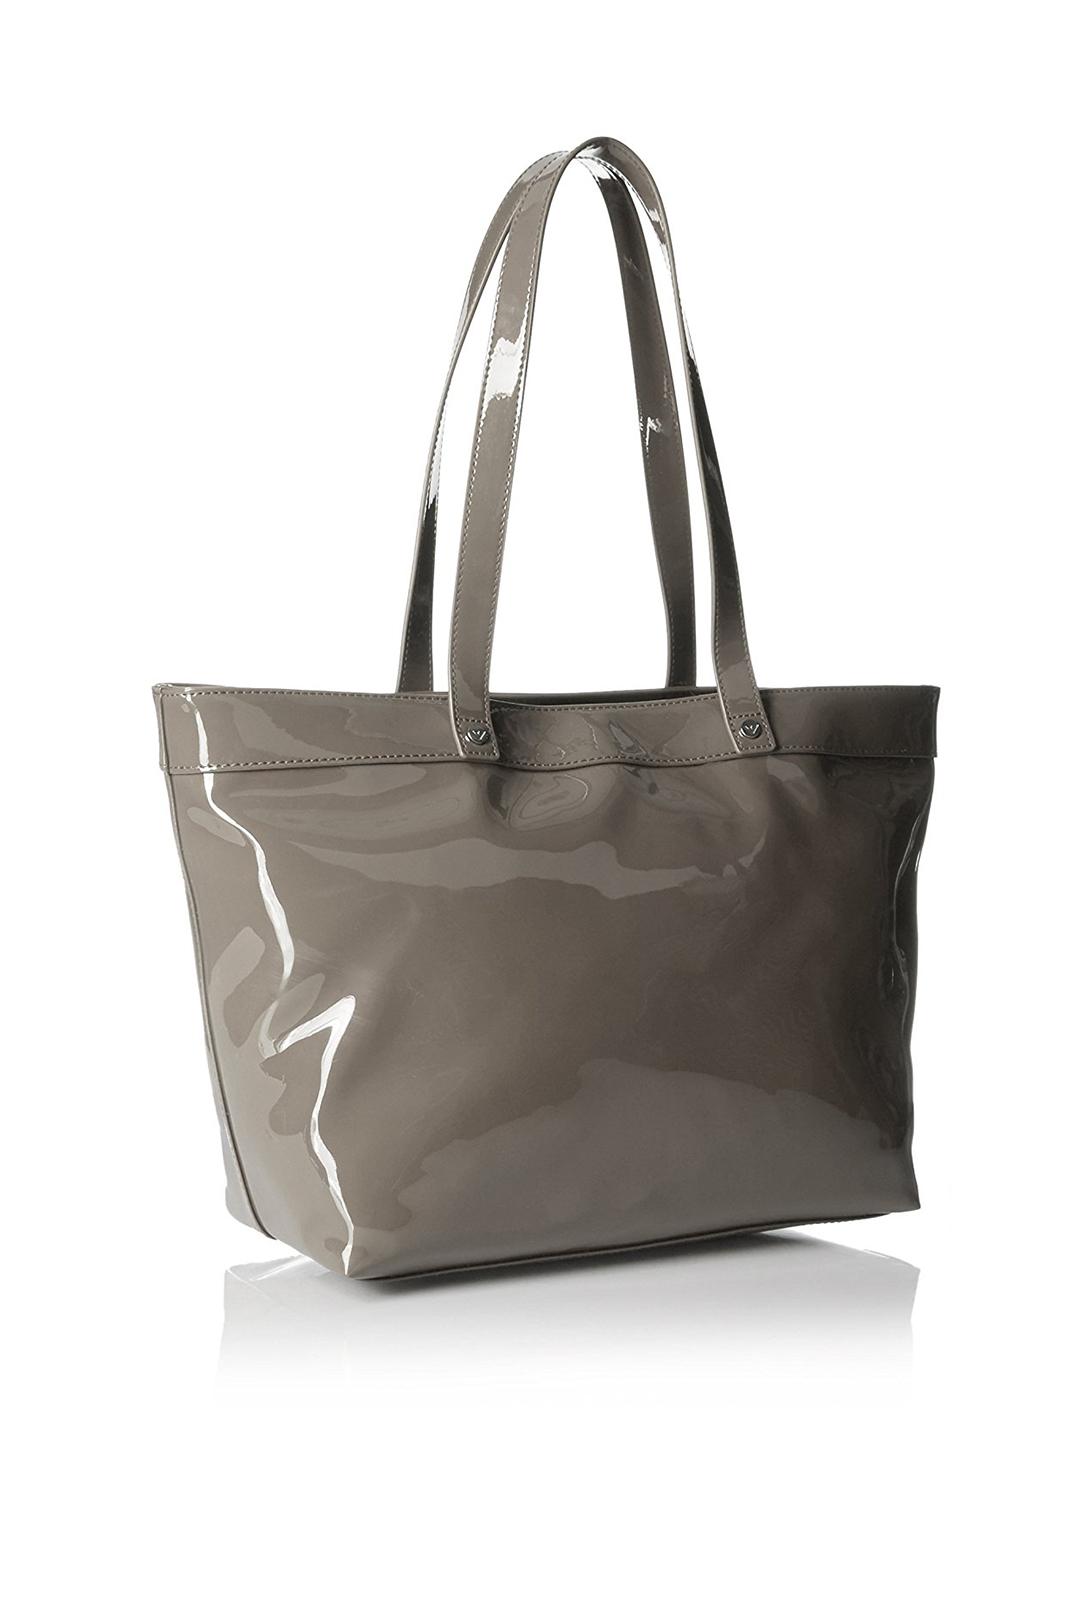 Cabas / Sacs shopping  Armani jeans 922505 CC850 07753 TAUPE